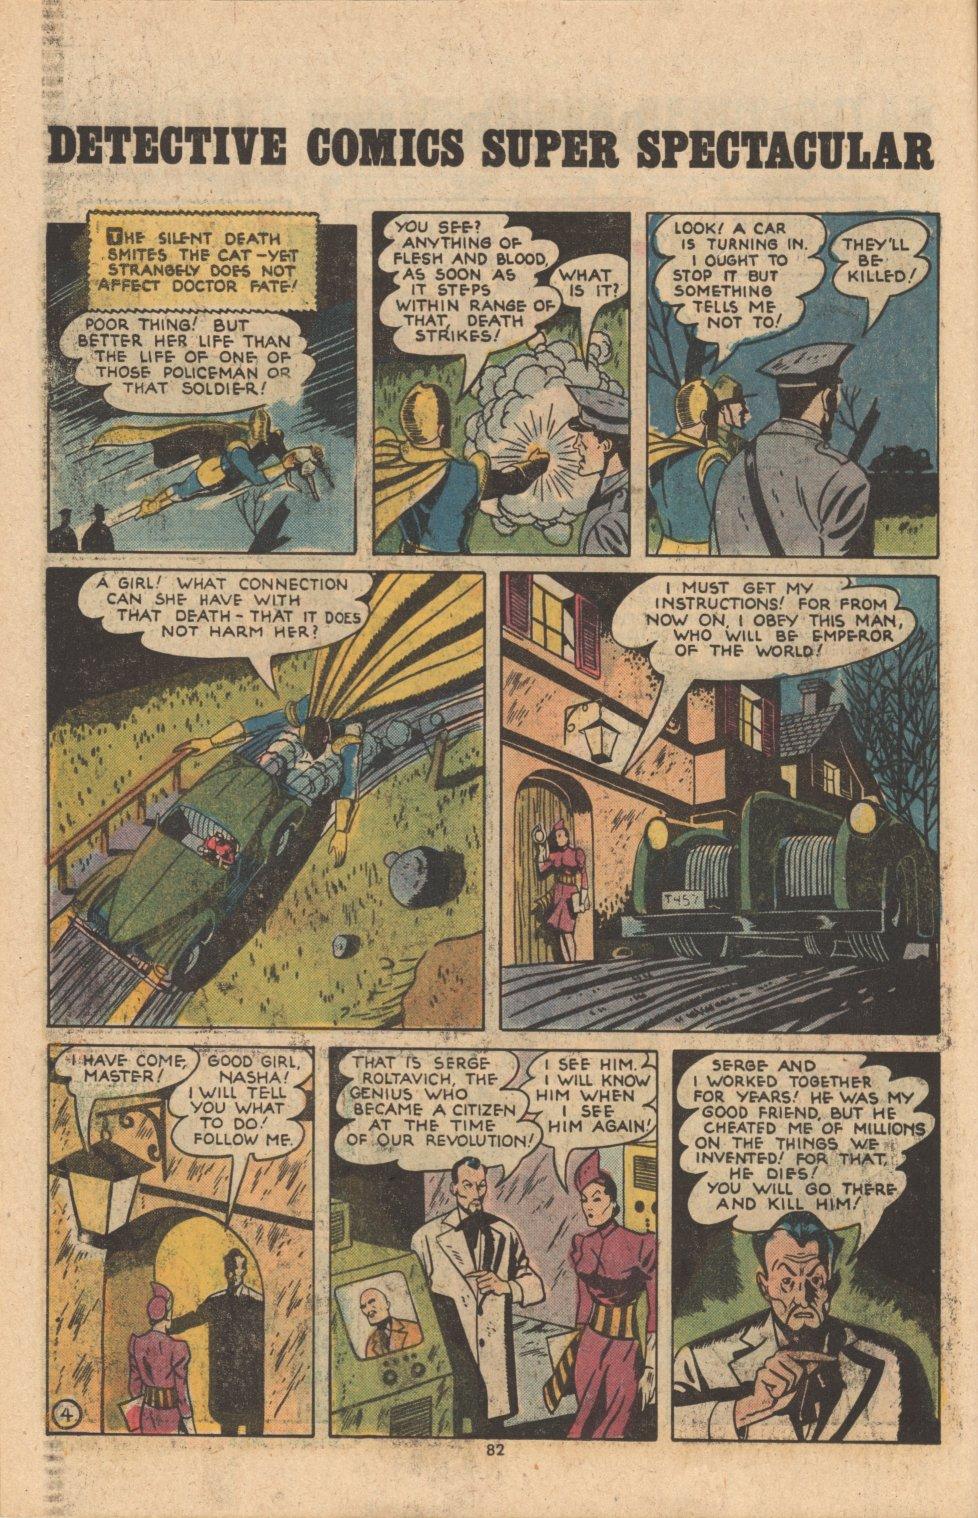 Detective Comics (1937) 442 Page 81